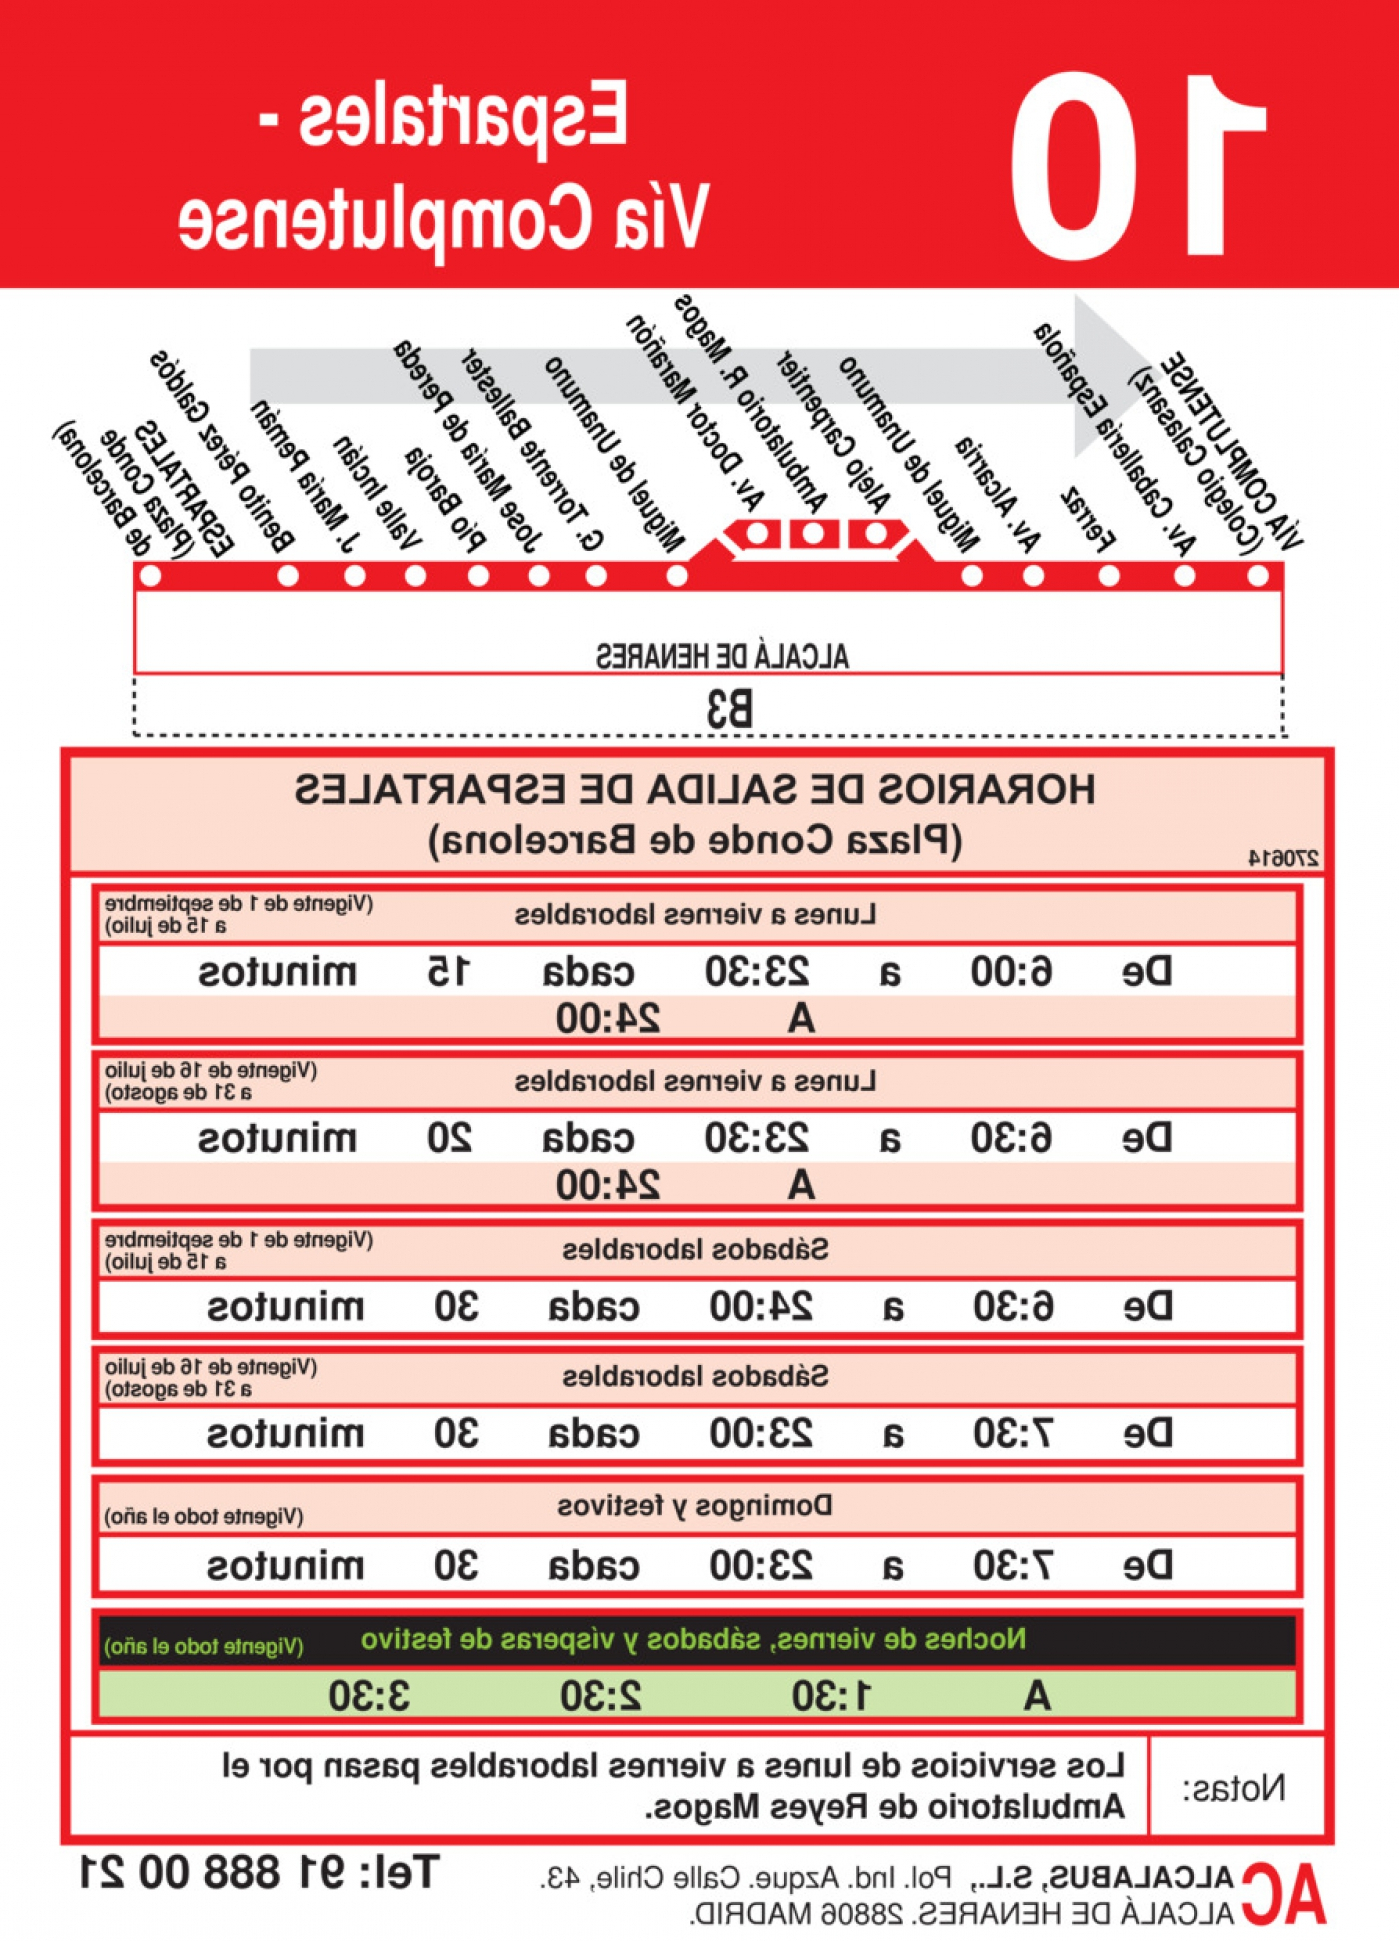 Horario Autobuses Alcala De Henares 8ydm Horarios De Autobús L 10 De Alcalà De Henares